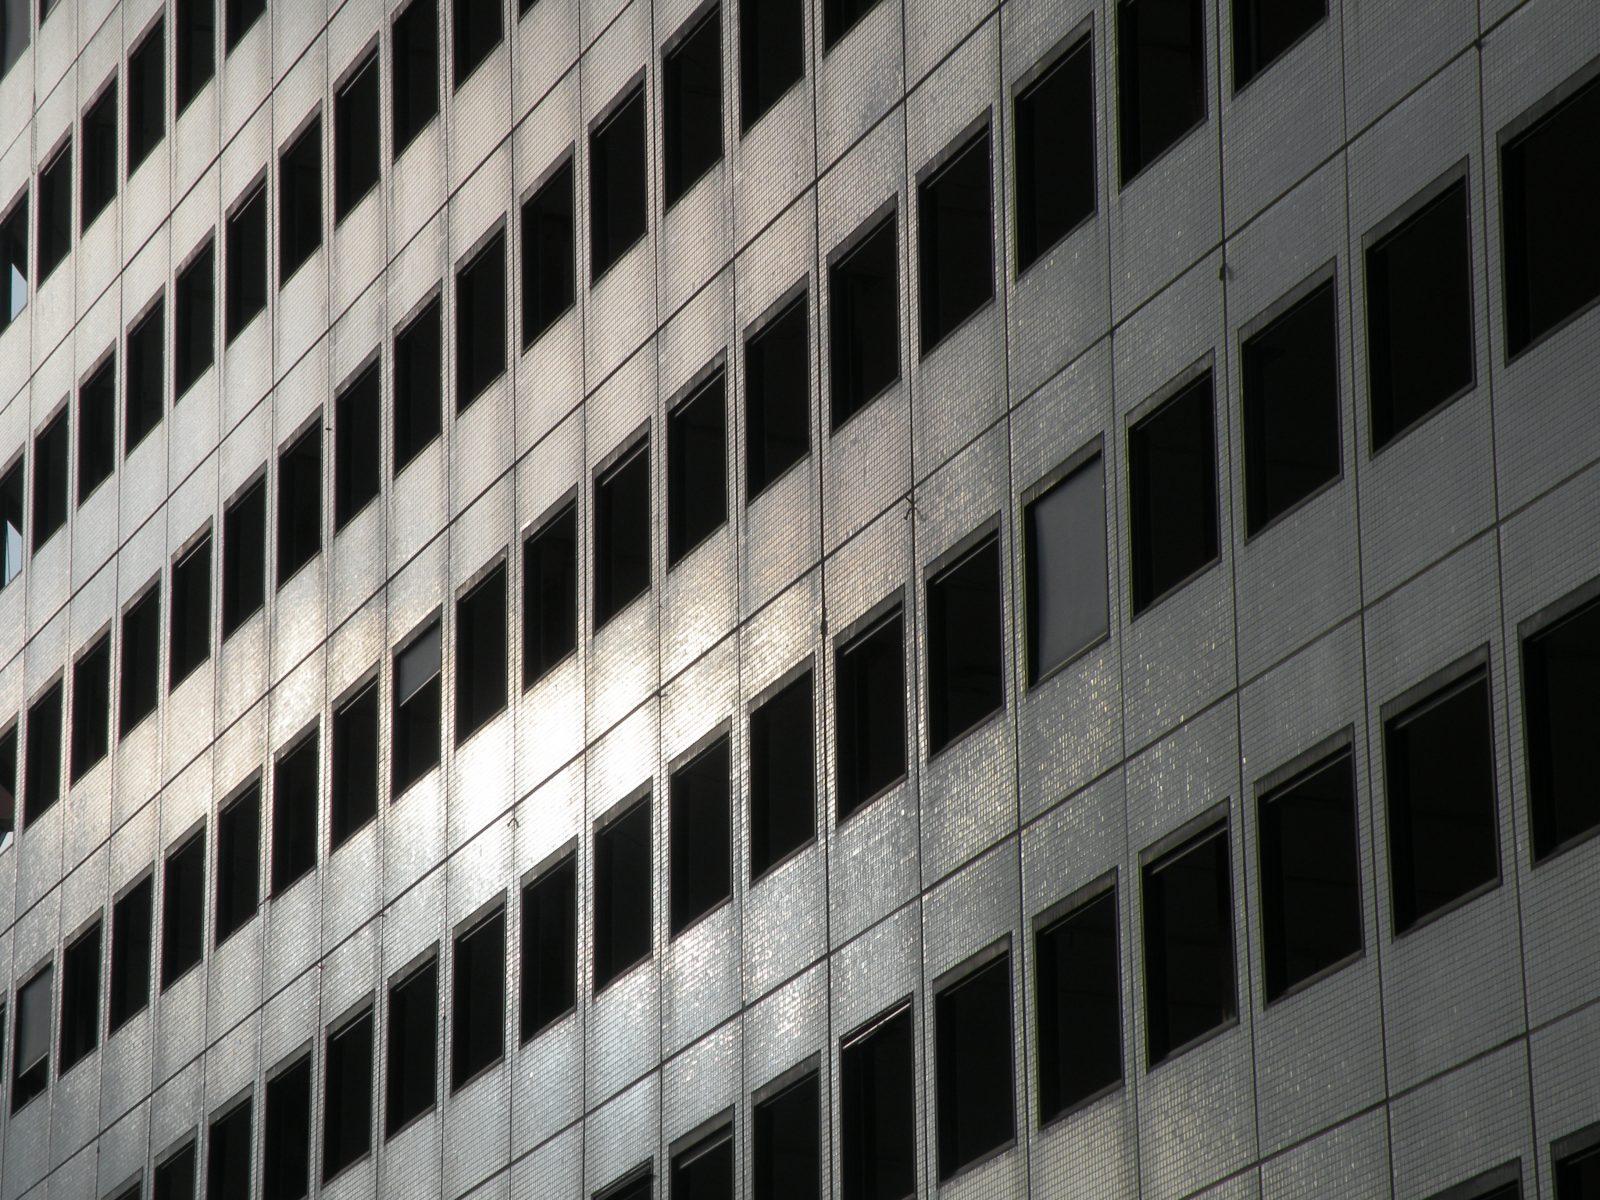 Oberfinanzdirektion Münster - Foto: Stefan Rethfeld